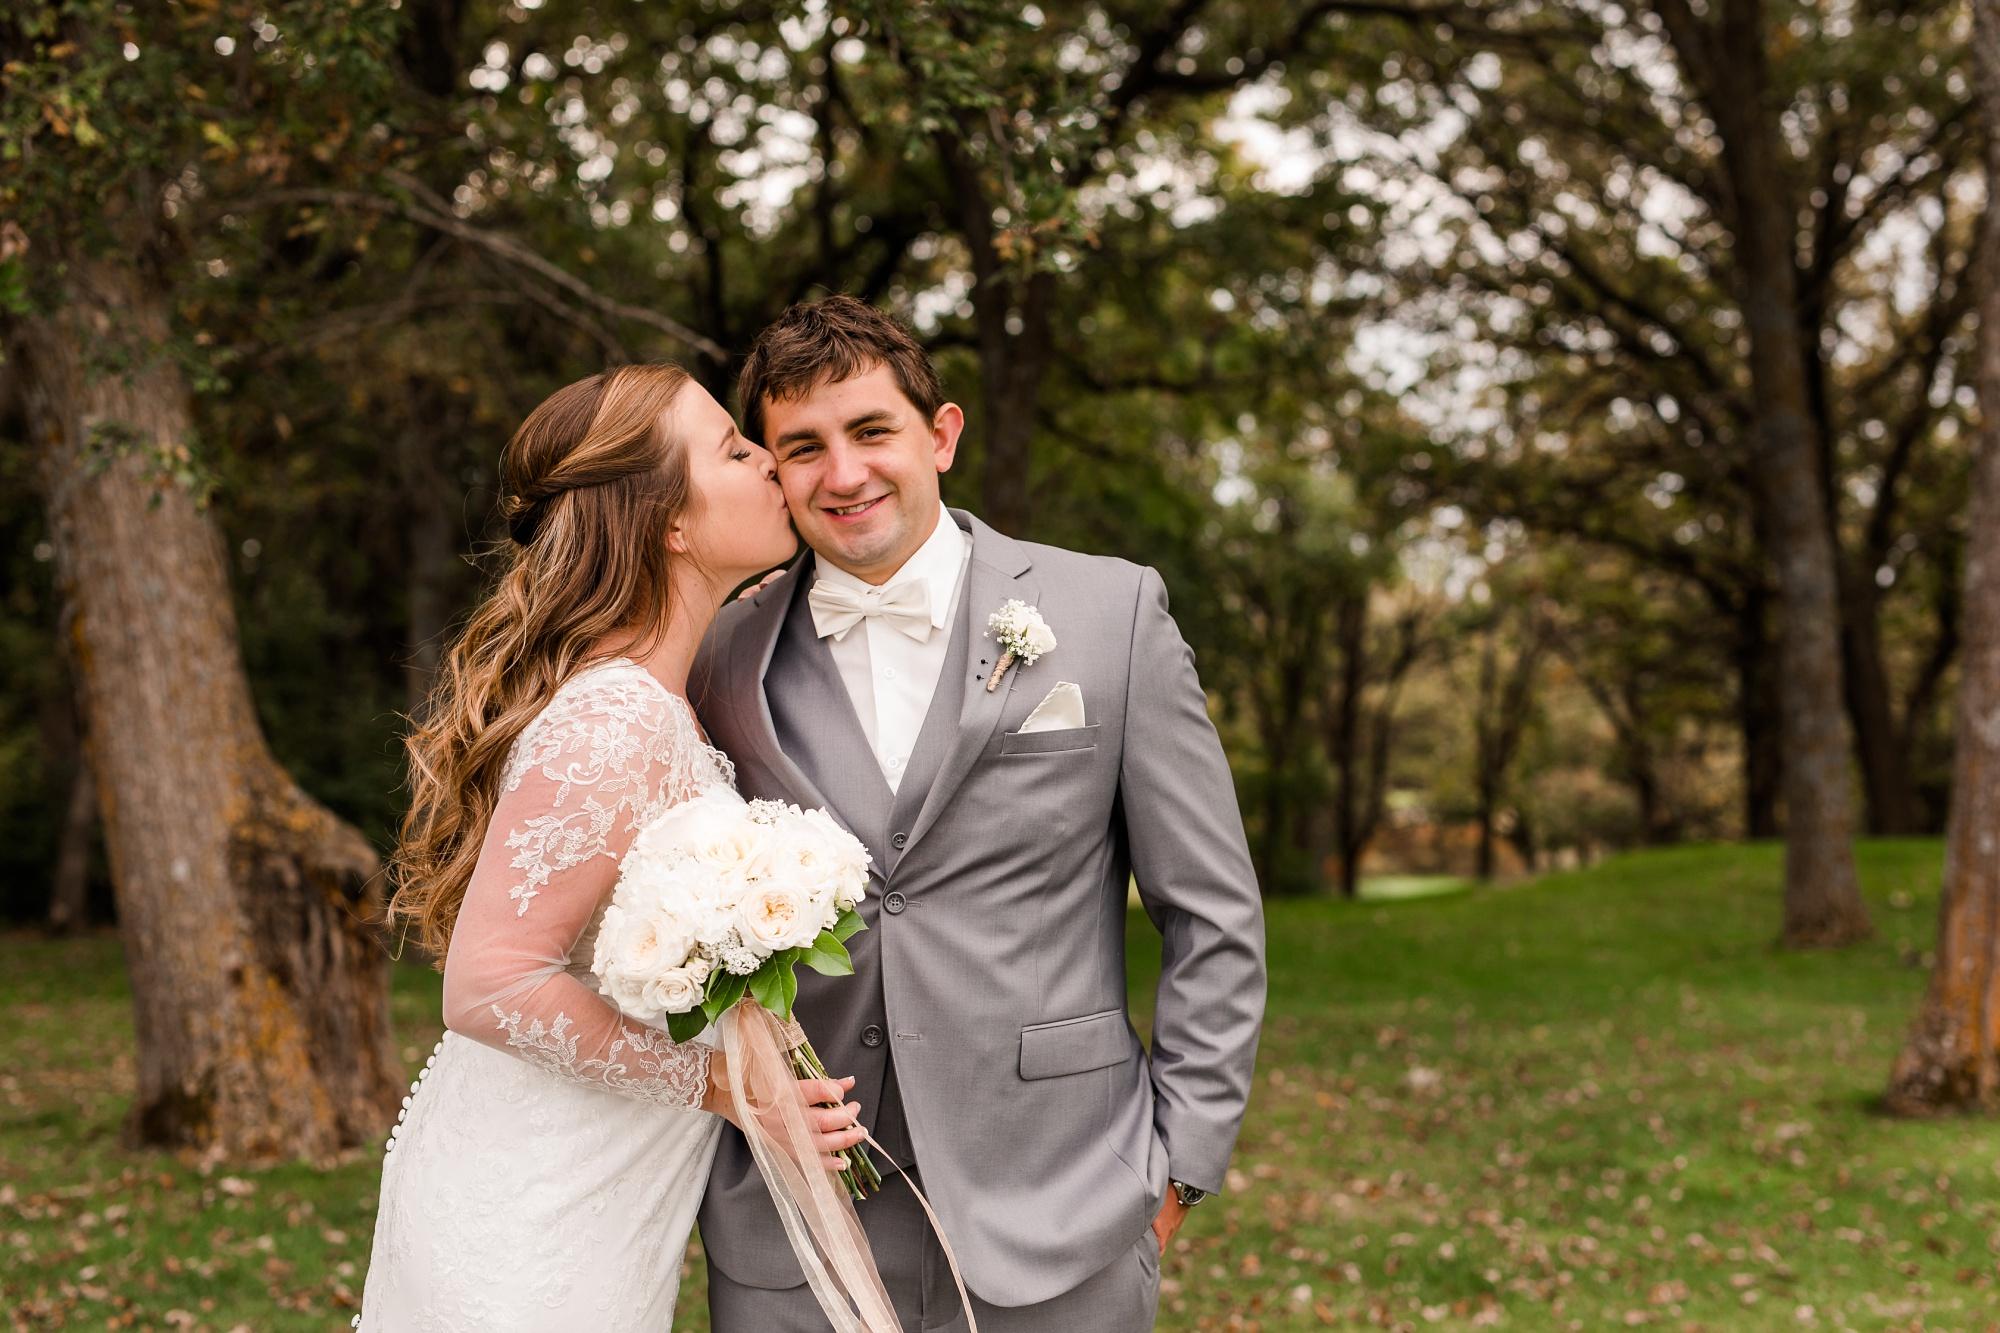 AmberLangerudPhotography_Fair Hills Resort Lakeside Wedding in Minnesota_3445.jpg